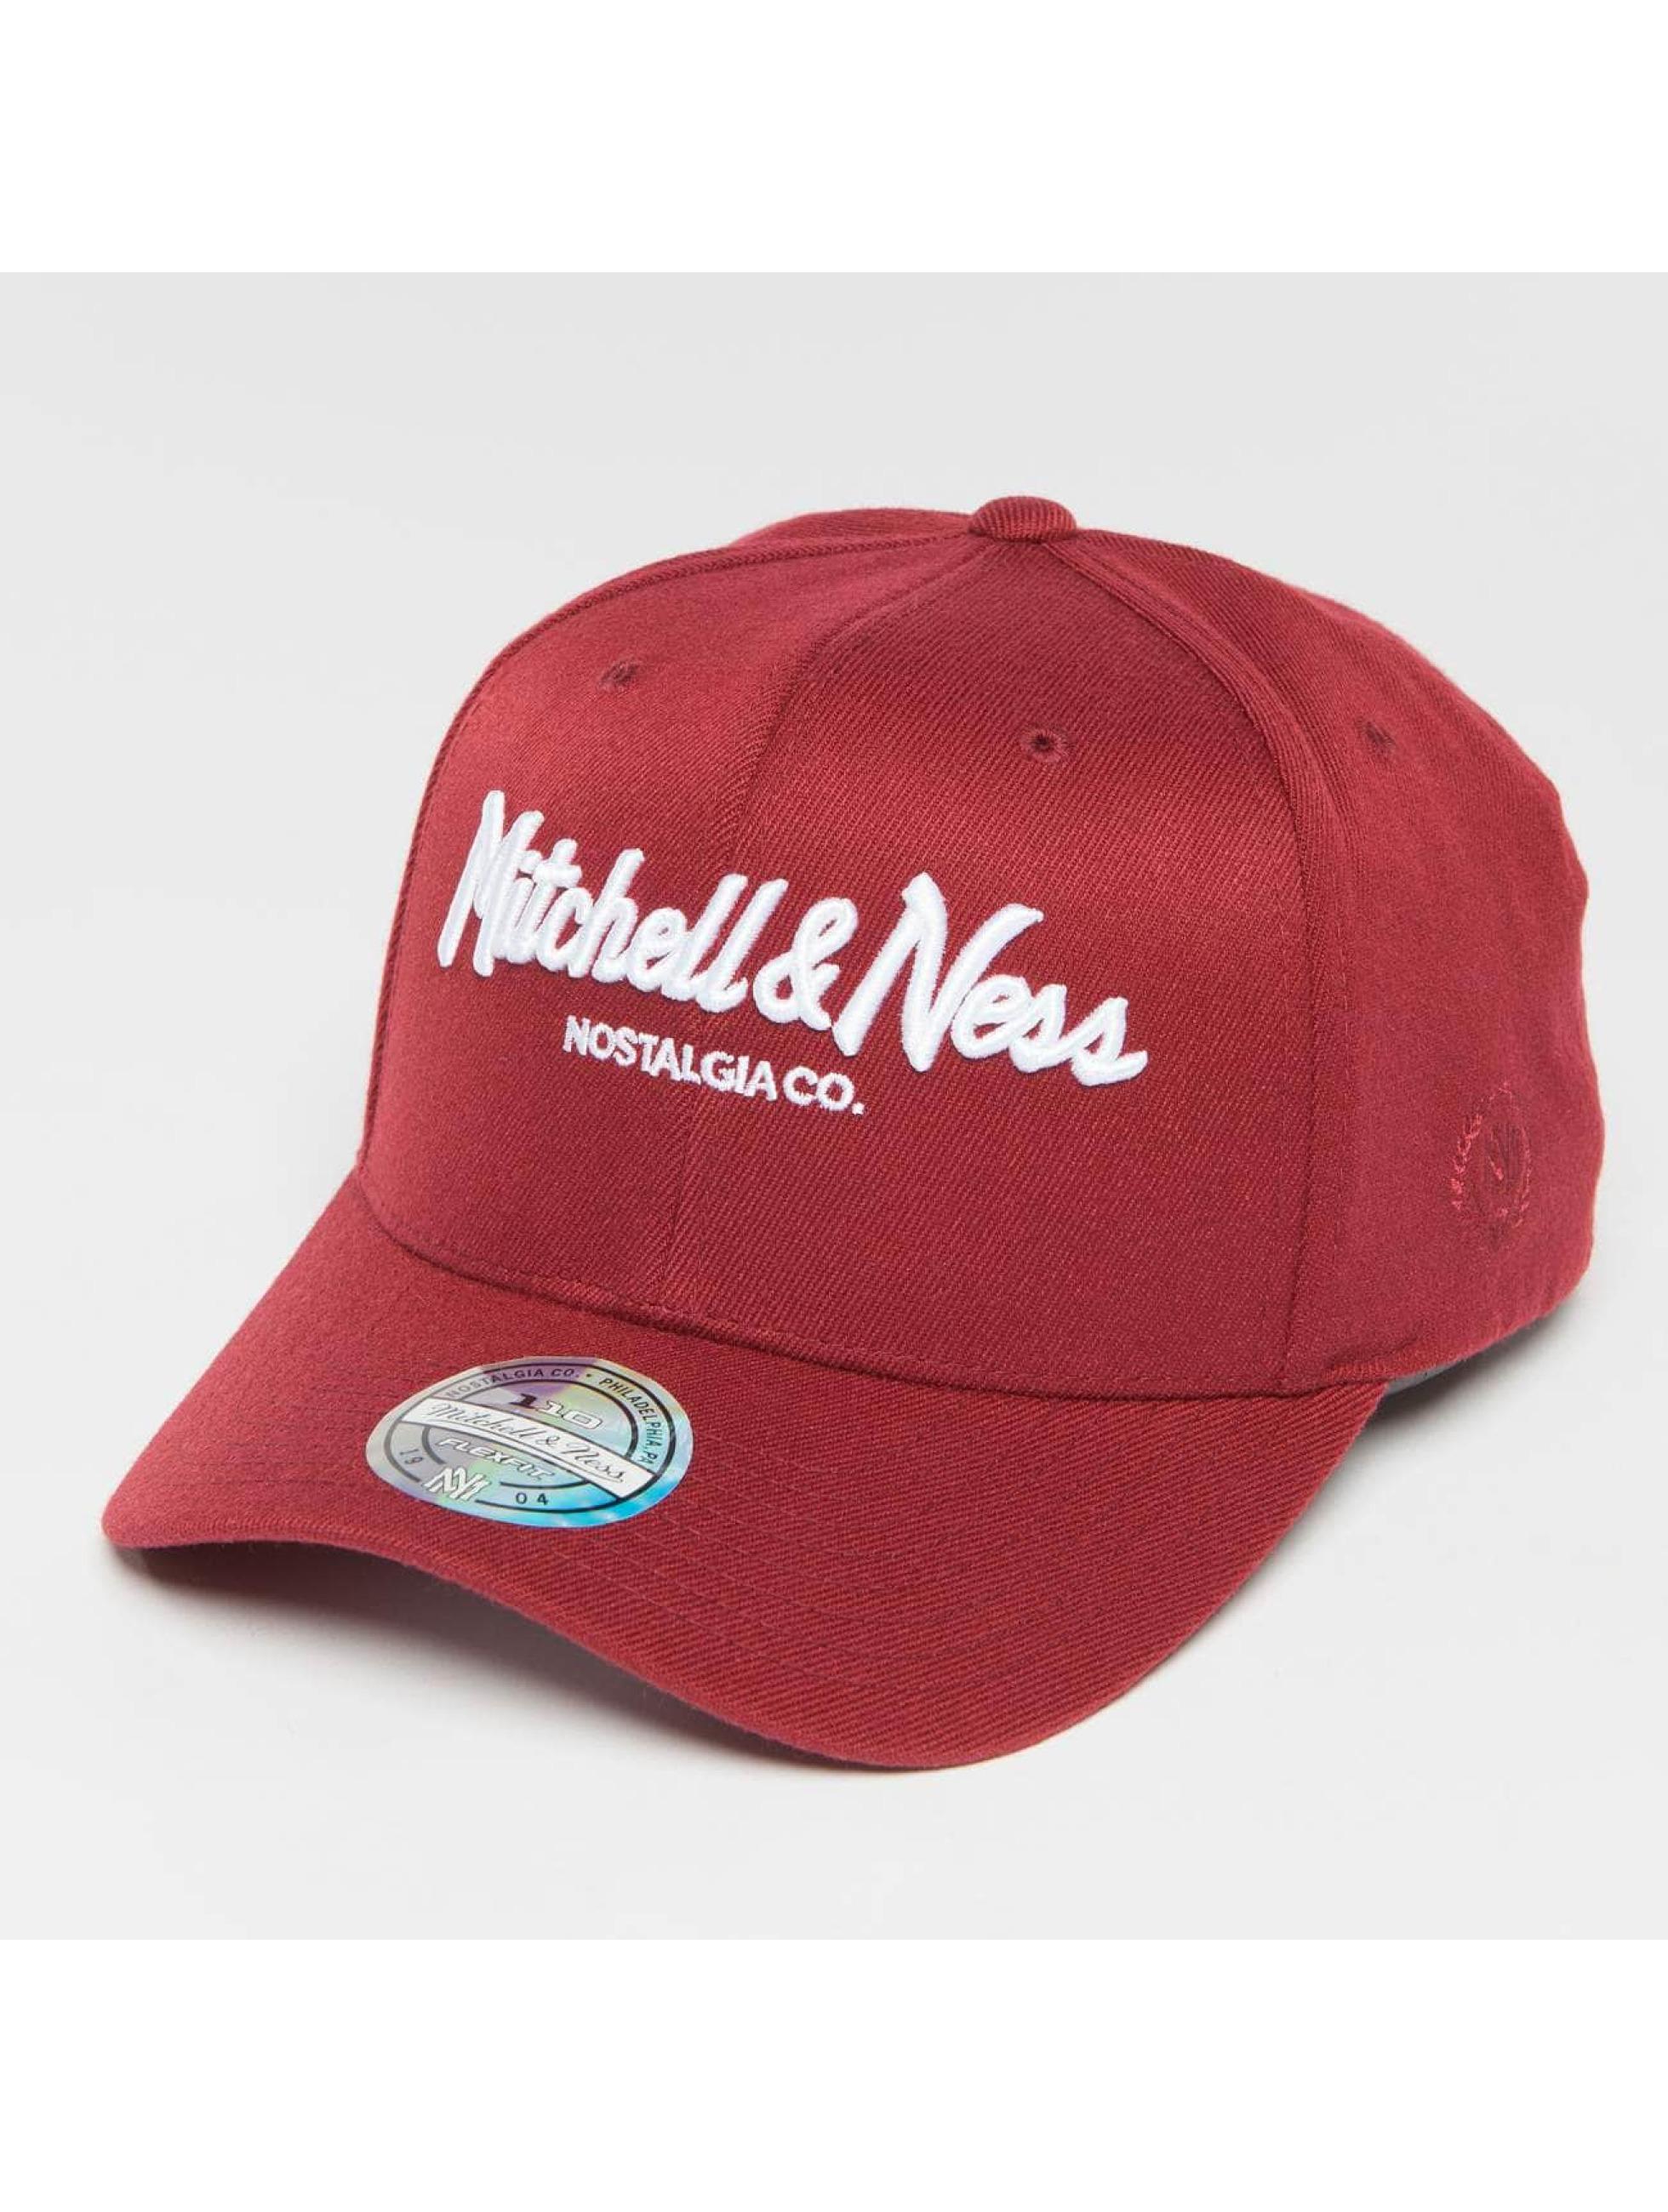 Mitchell & Ness Gorra Snapback The Burgundy 2-Tone Pinscript 110 rojo